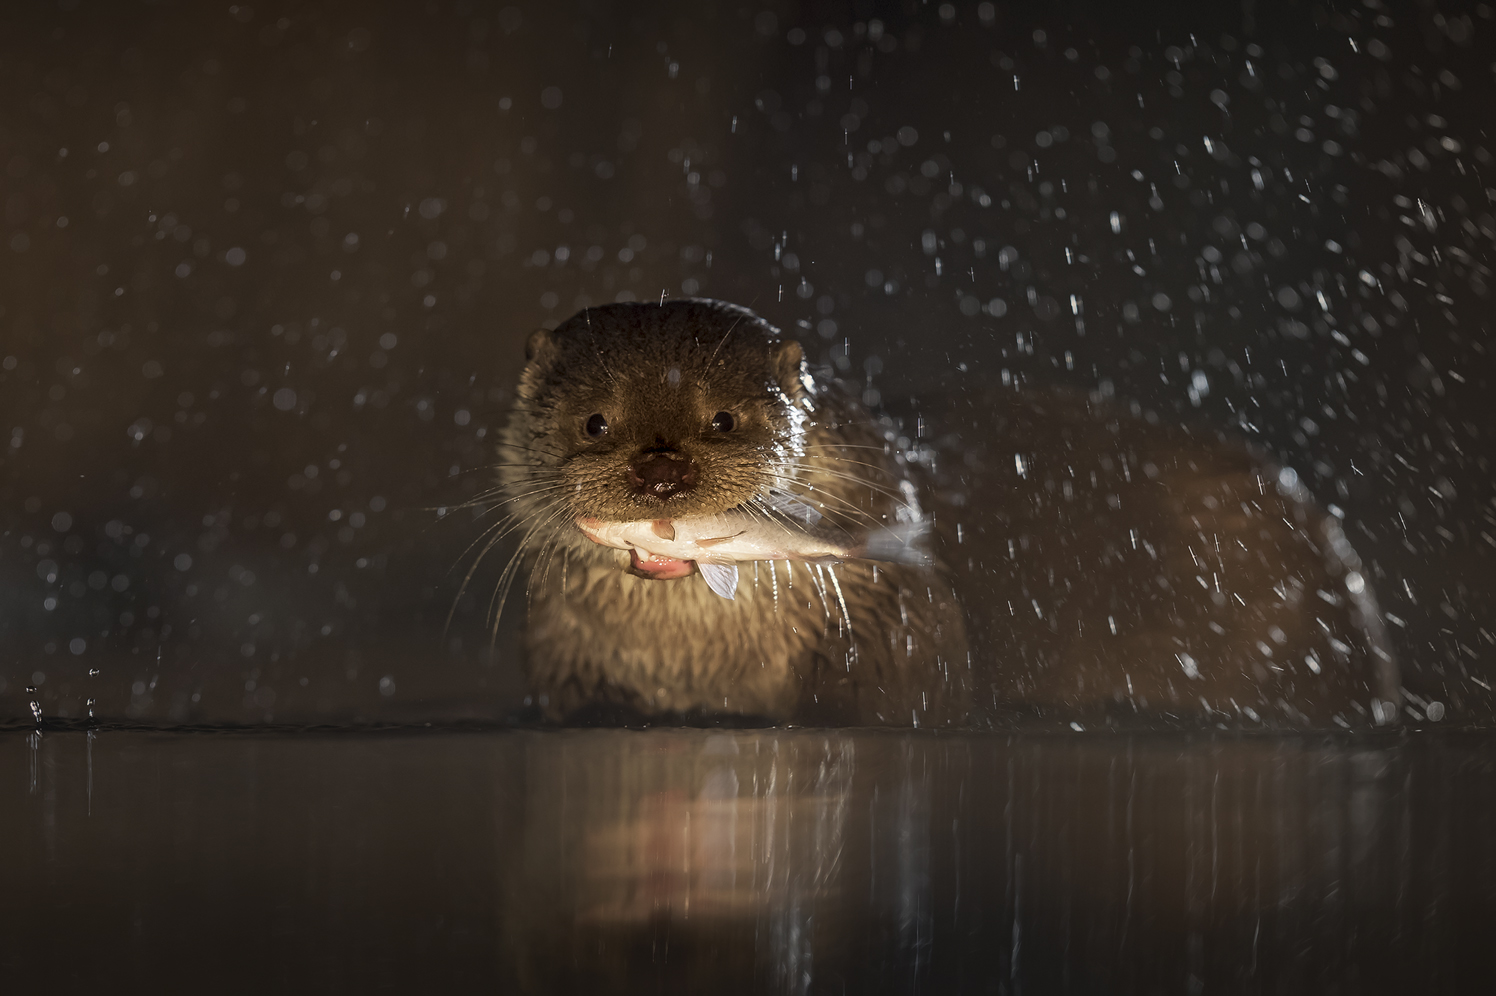 Fisch + Otter